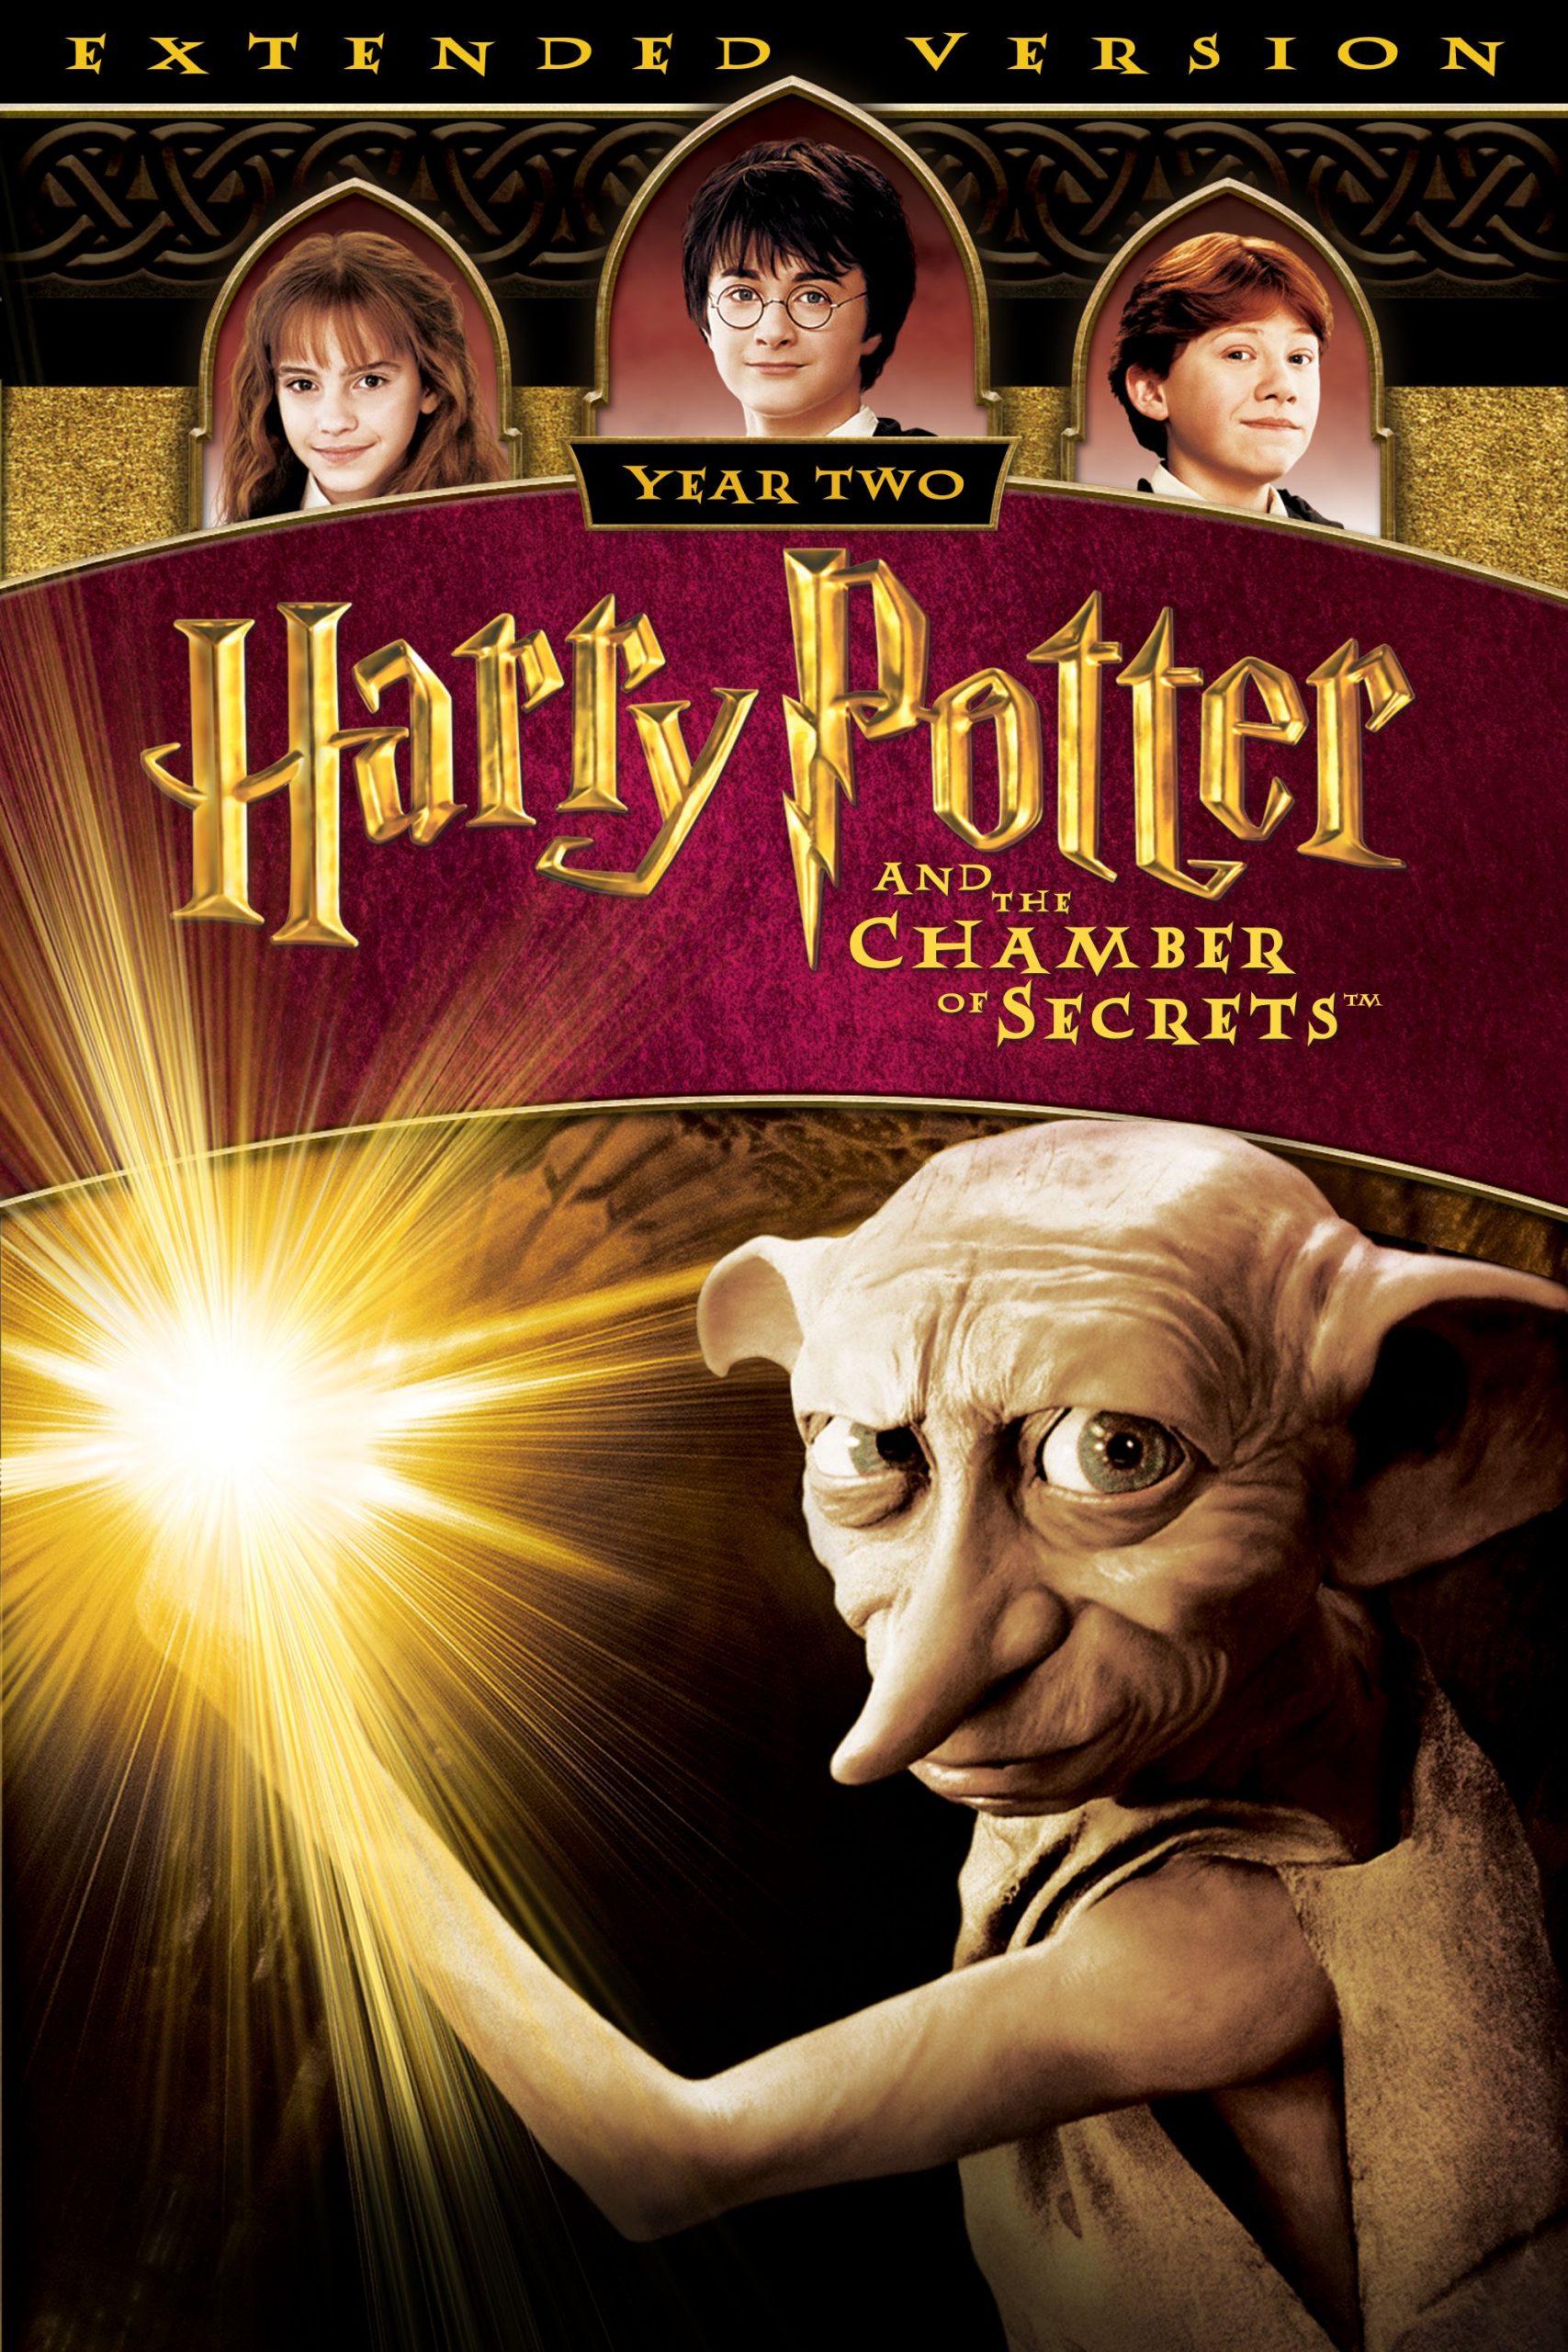 Common words:Harry Pottter, the chamber of secrets by J.K Rowling, J.K Rowling'novel, Harry Potter series